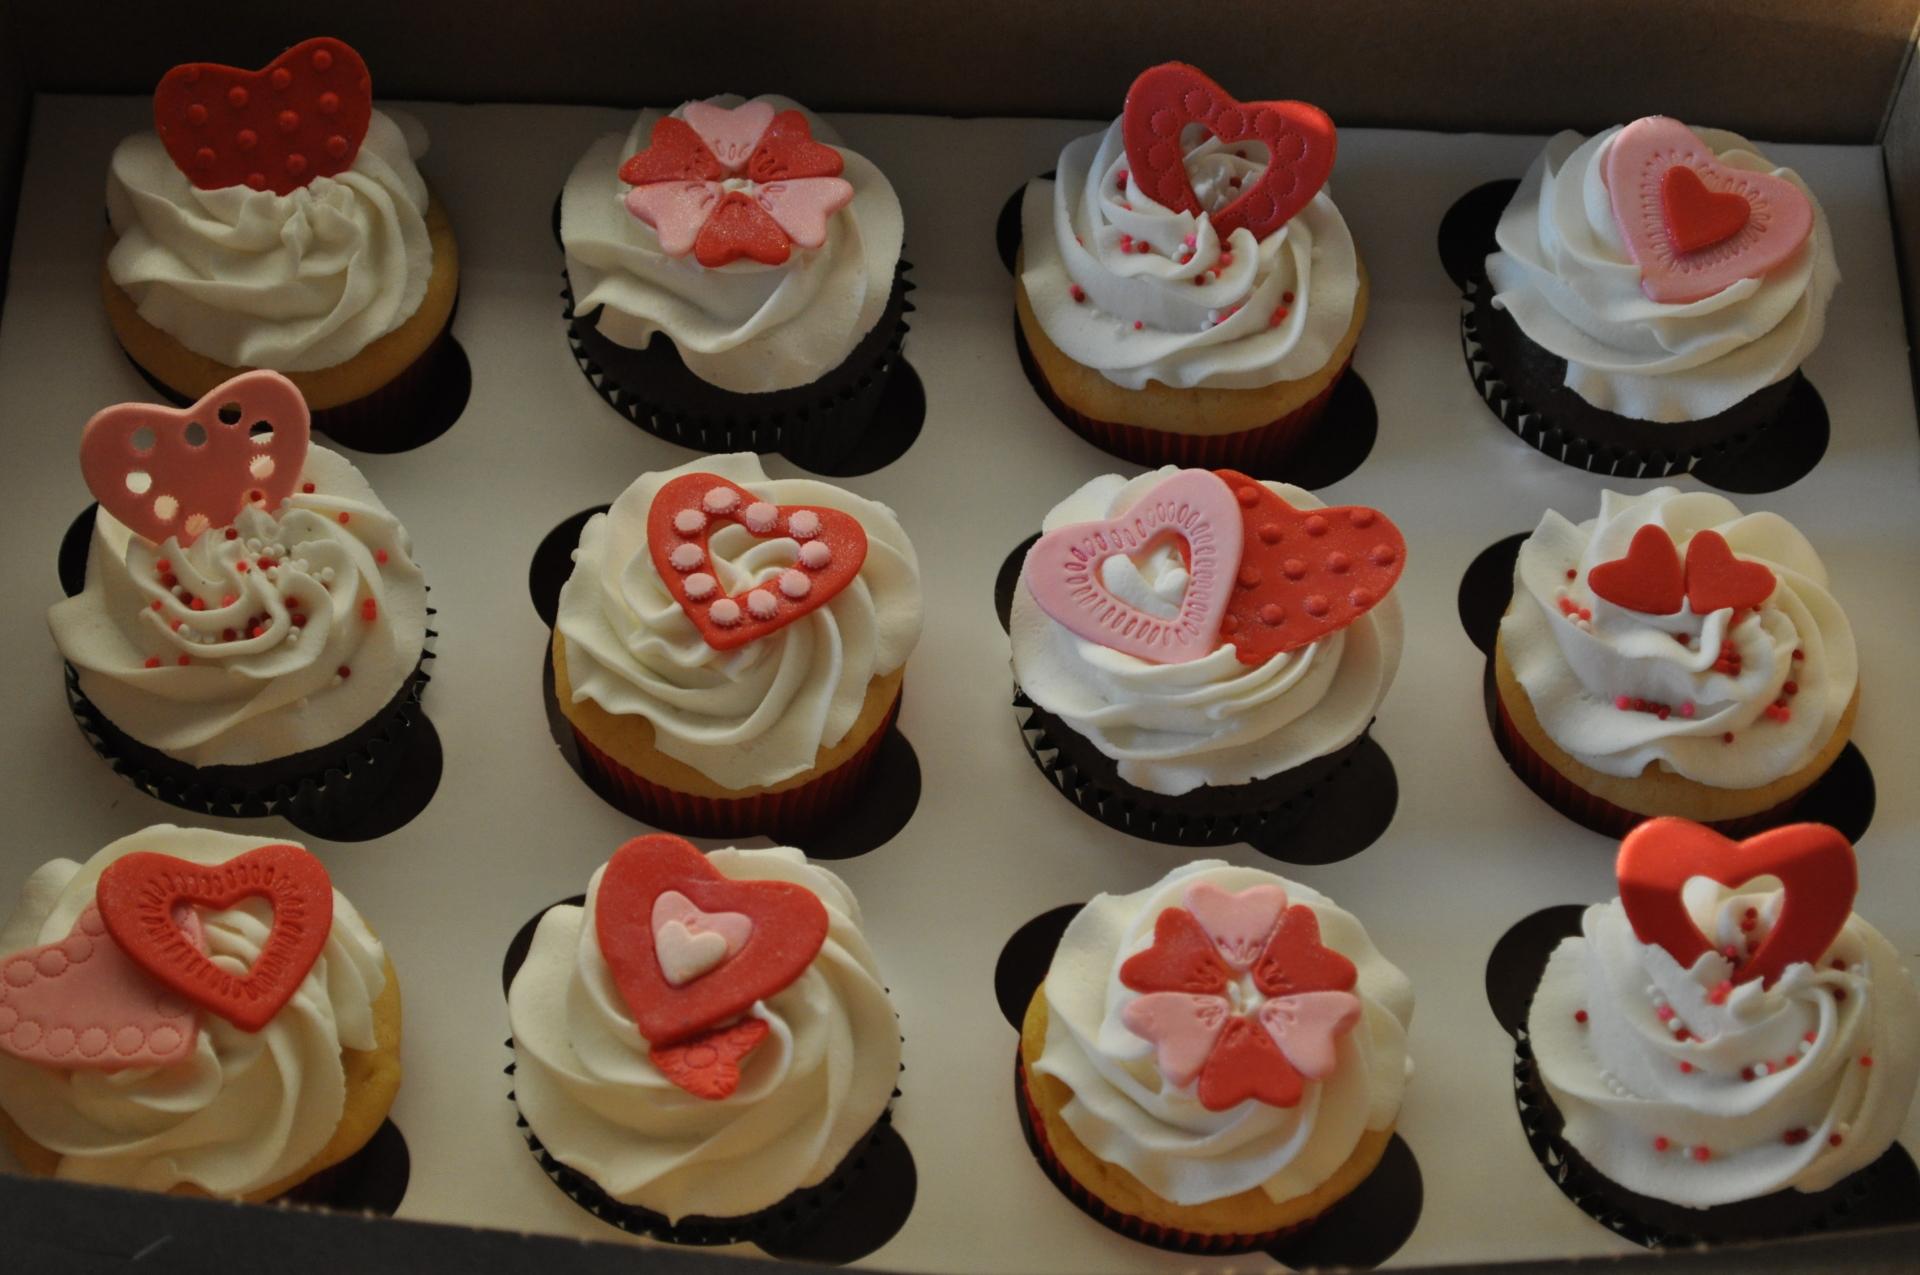 Valentine's cupcakes, anniversary cupcakes